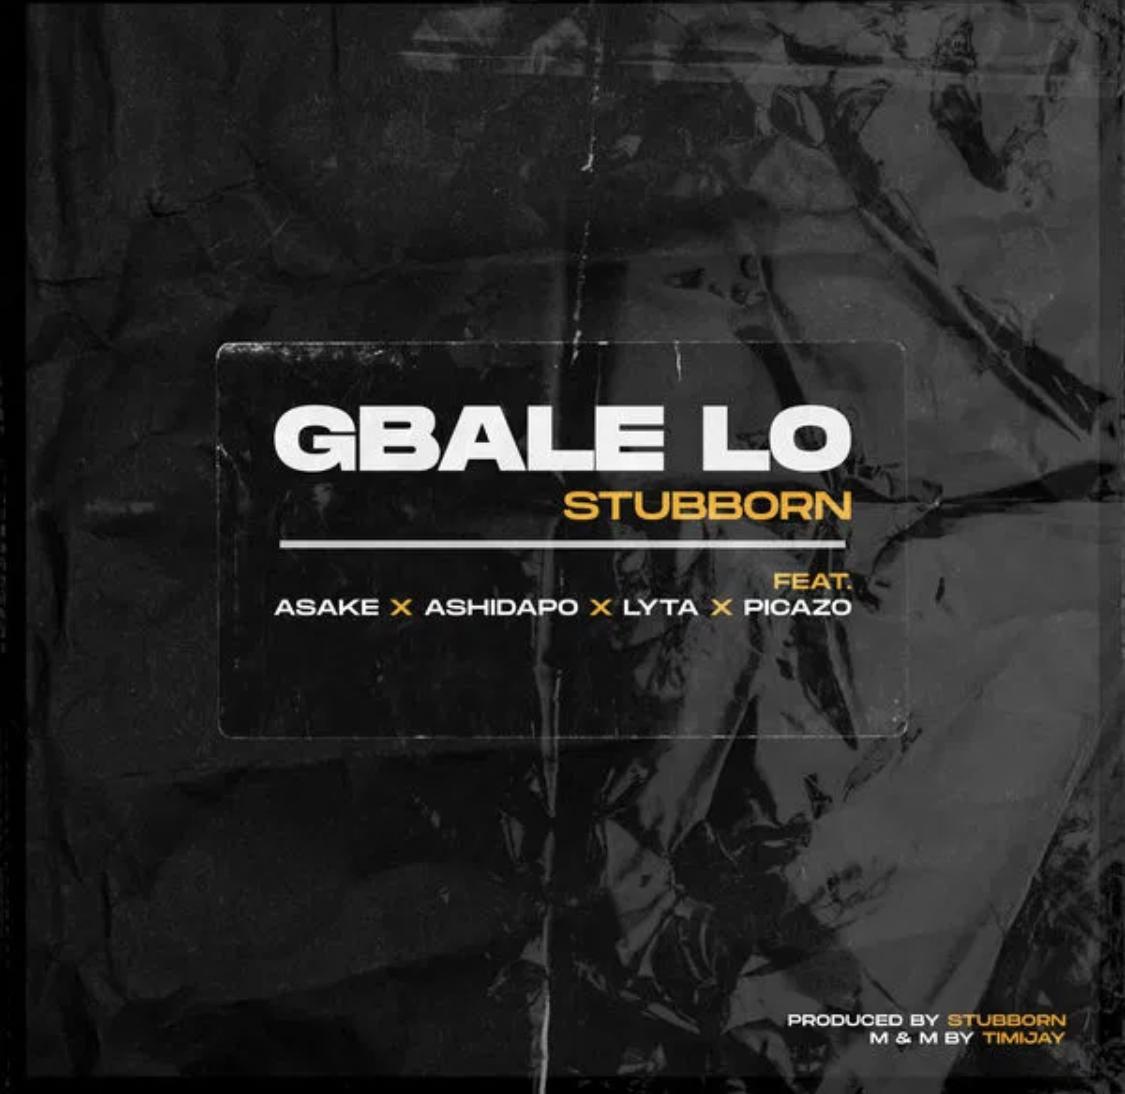 Stubborn Beatz Ft. Asake, Ashidapo, Lyta & Picazo – Gbale Lo